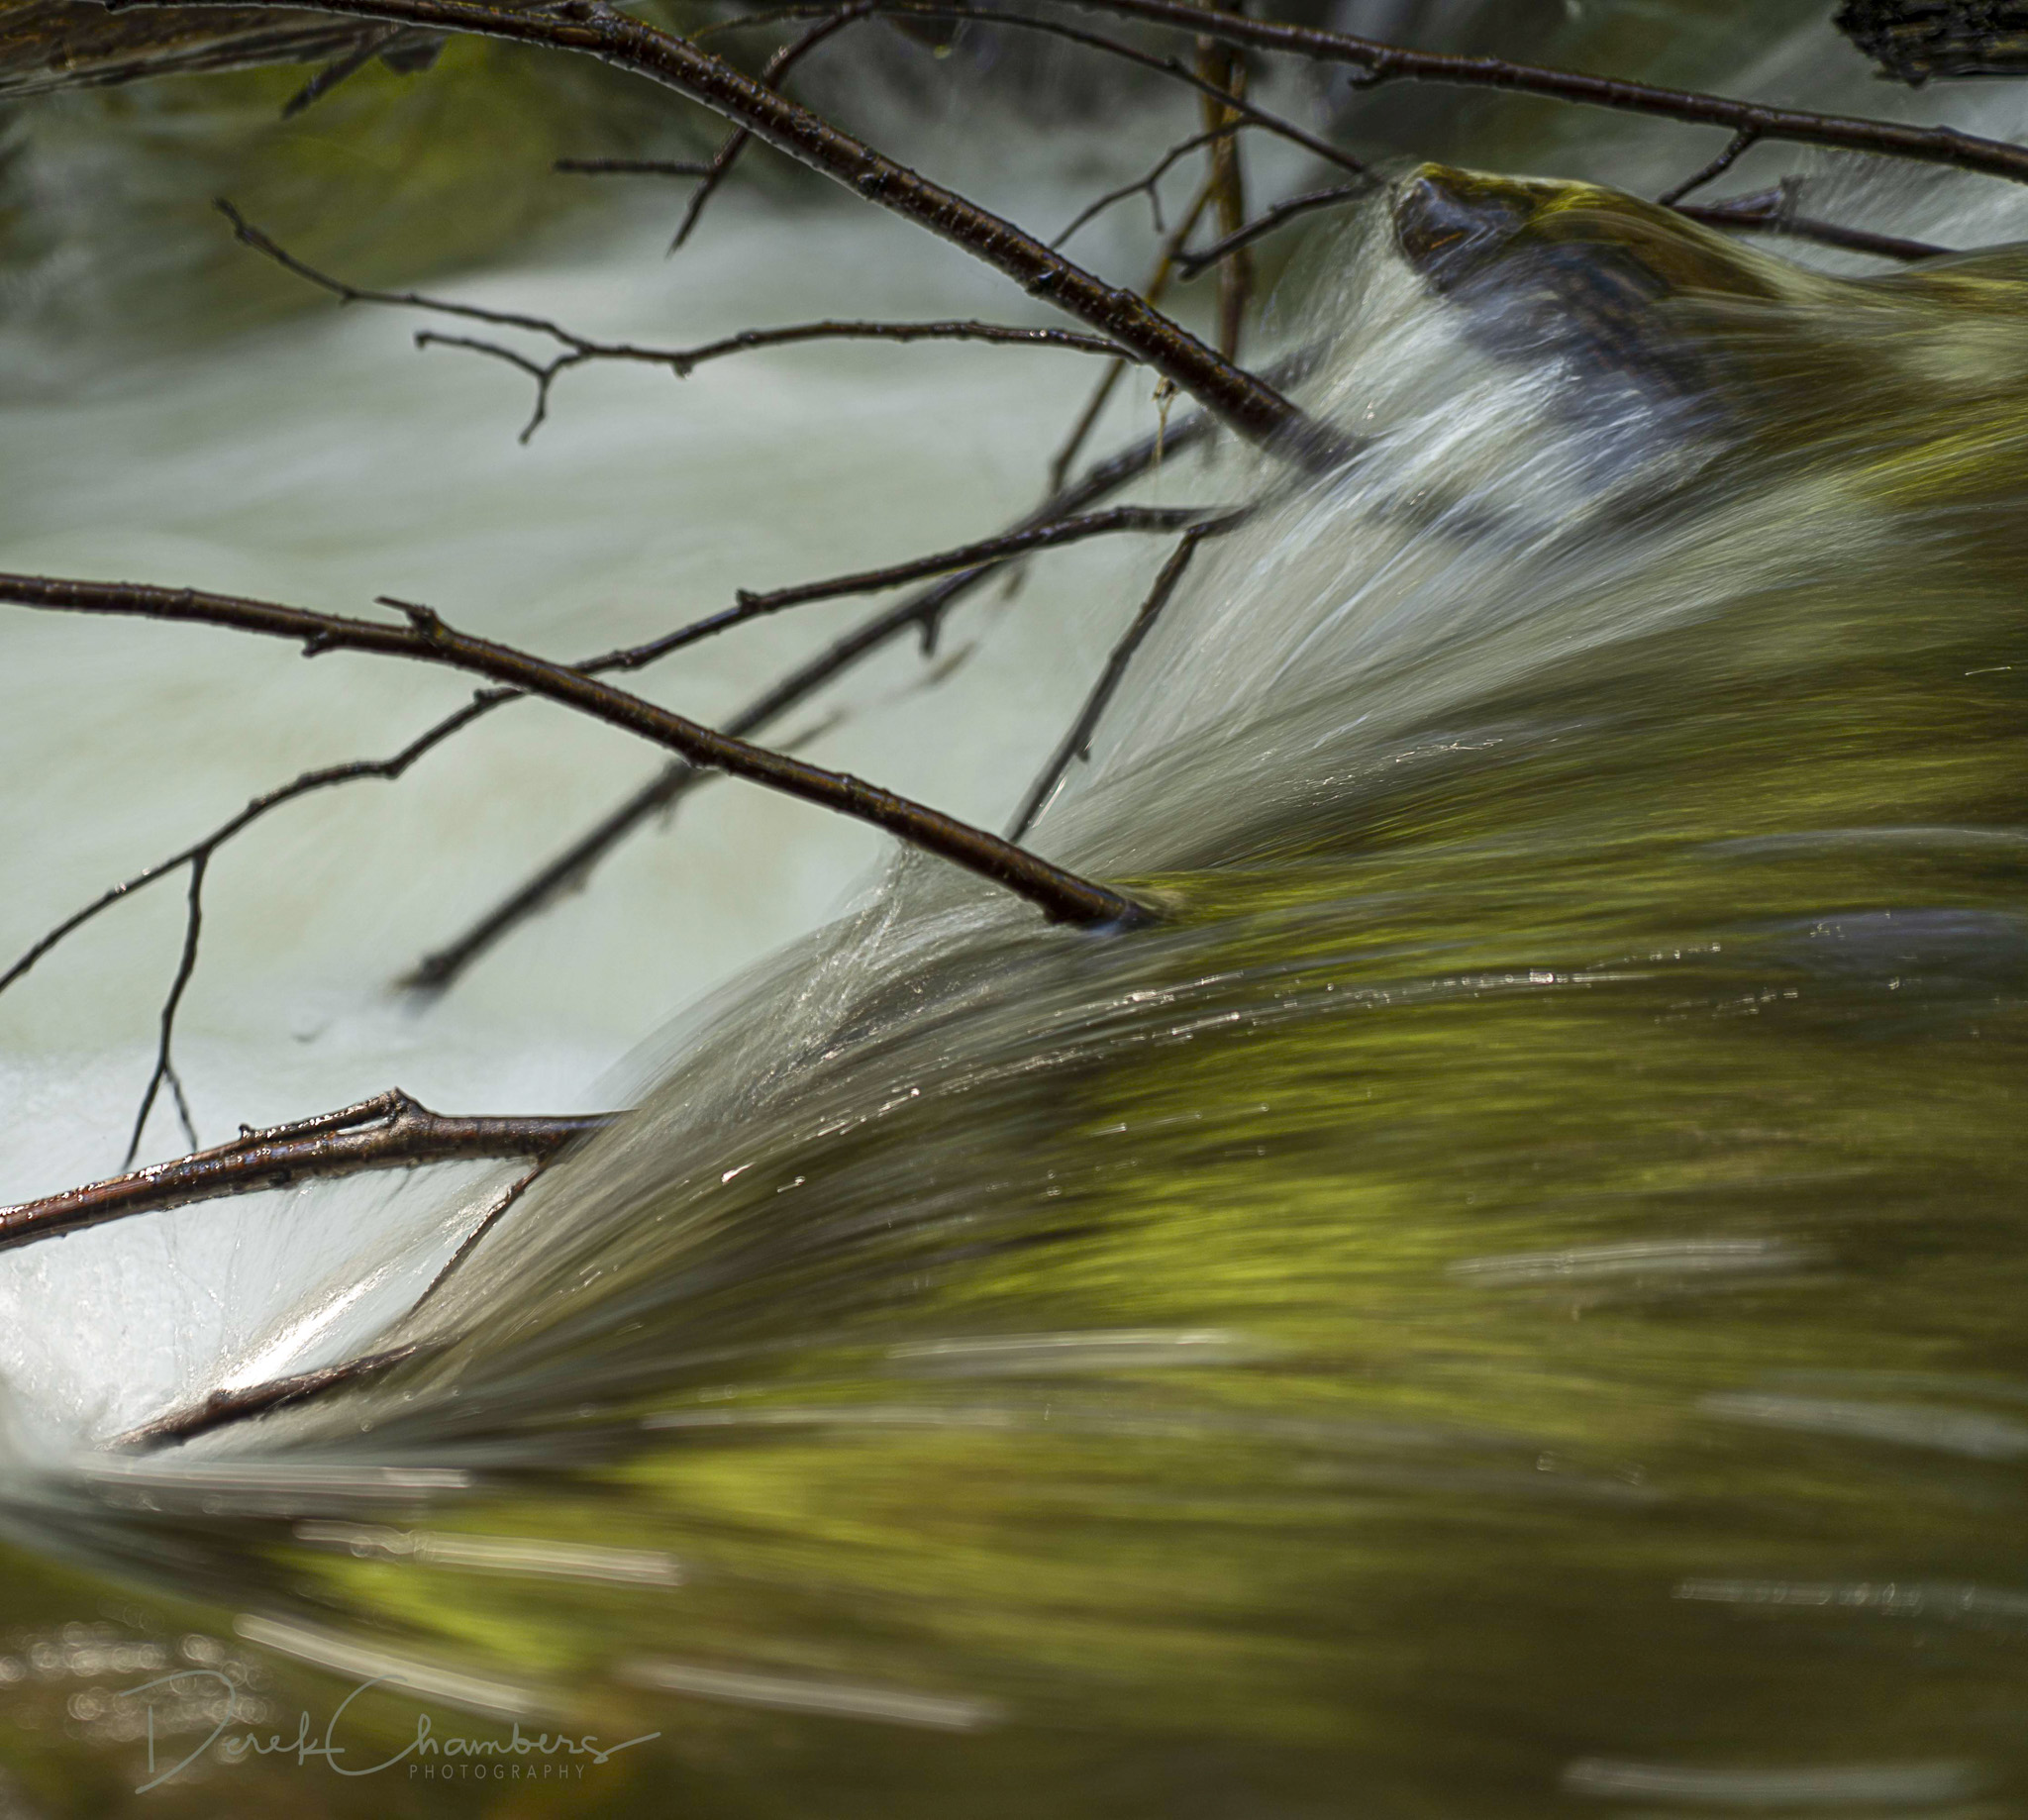 Water Curtain - Eakin Creek Canyon Provincial Park - Derek Chamb